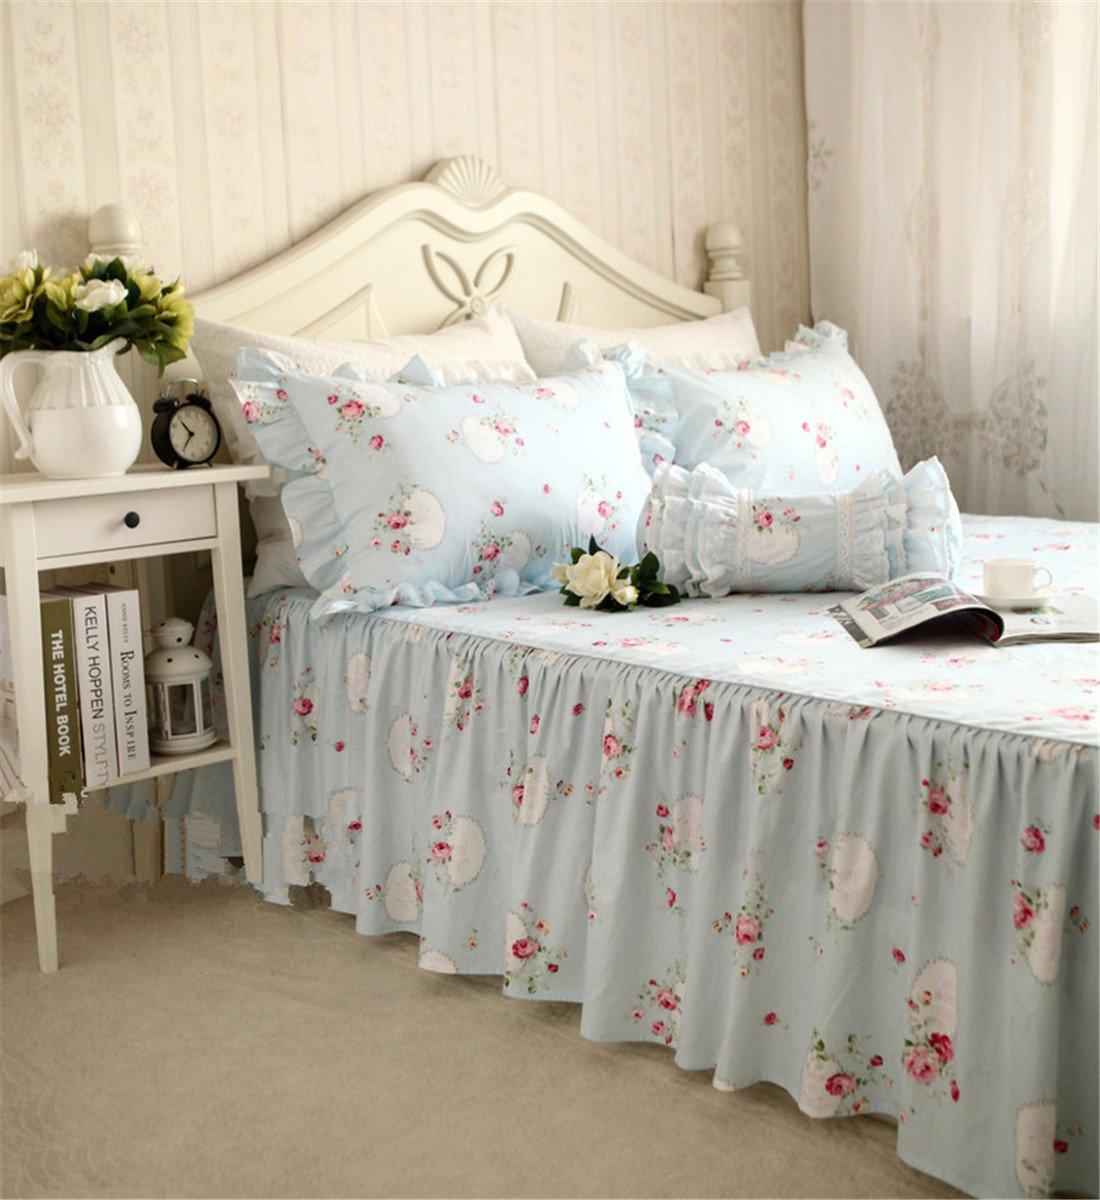 Lotus Karen 100%Cotton Blue Pastoral Flowers 4PC Floral Bed Sheet Set Ruffles Korean Bedding Set With Romantic Love Letters Patterns For Wedding Bedding King,1Duvet Cover,1Bedskirt,2Pillowcases by Lotus Karen (Image #4)